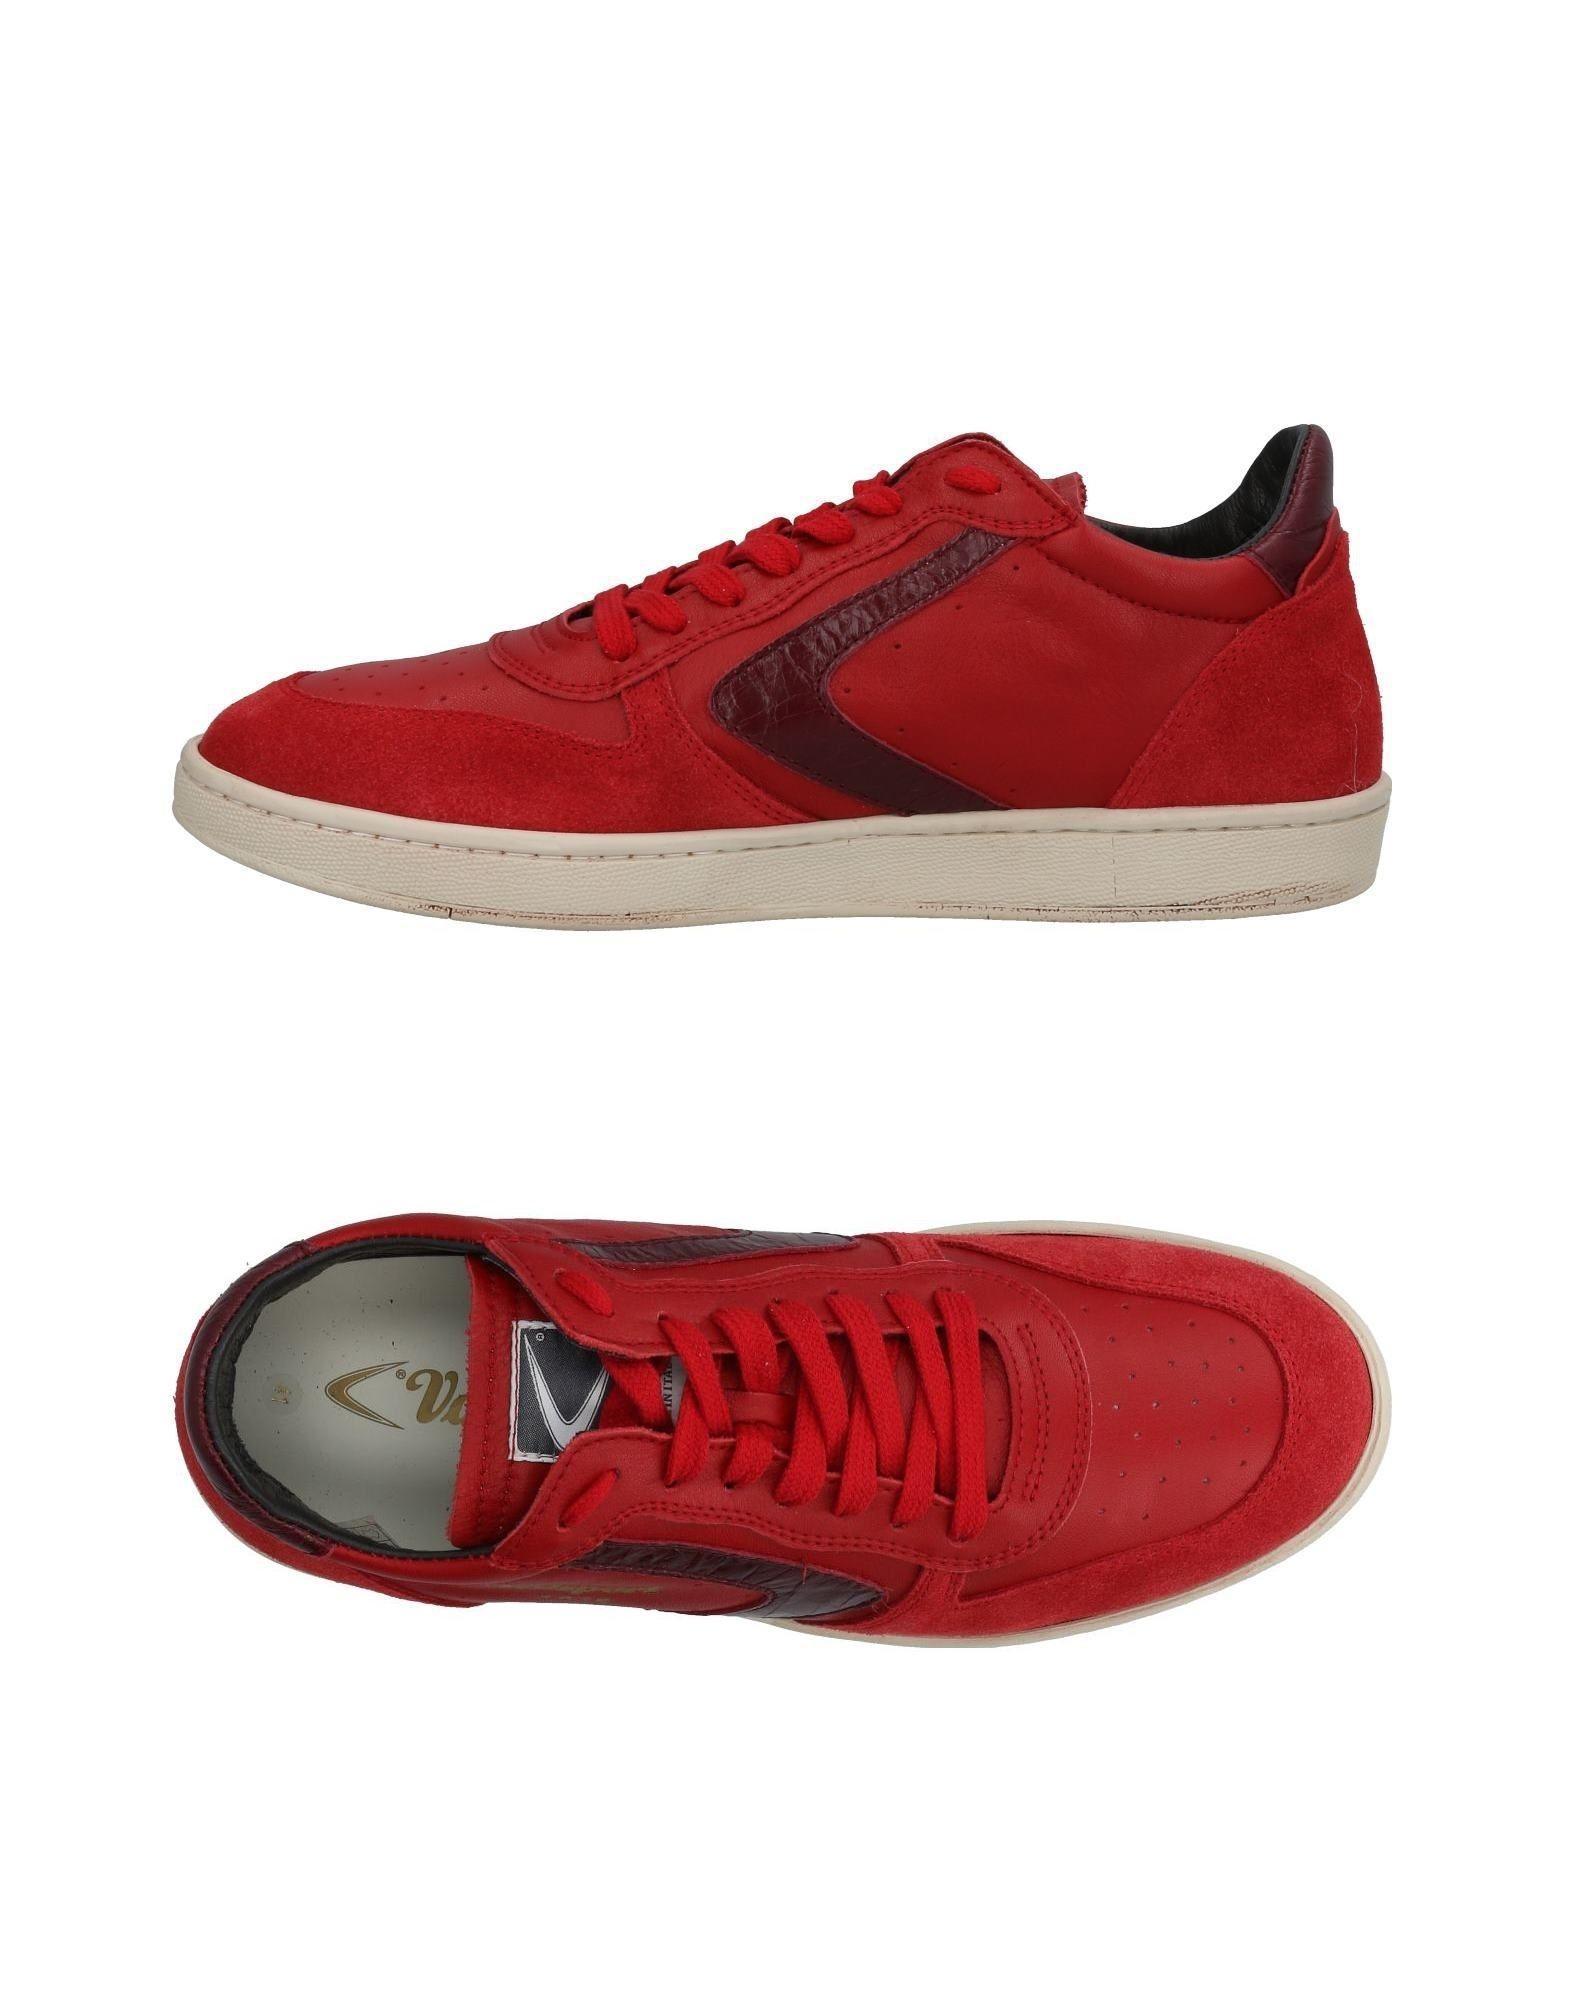 Valsport Sneakers In Red